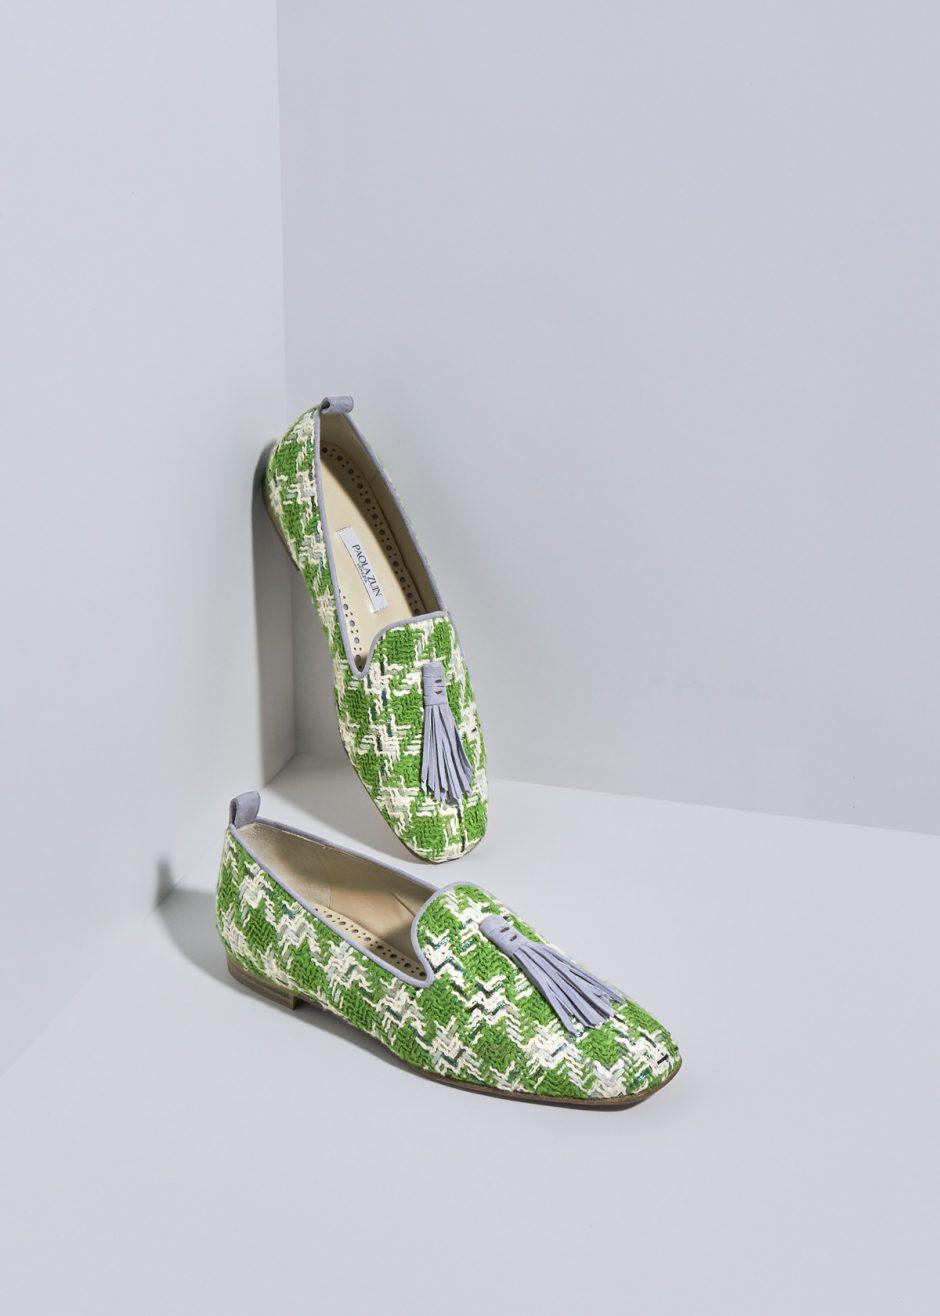 Sveva – Ballerina in pied de poul verde/avorio e nappina in suede grigio